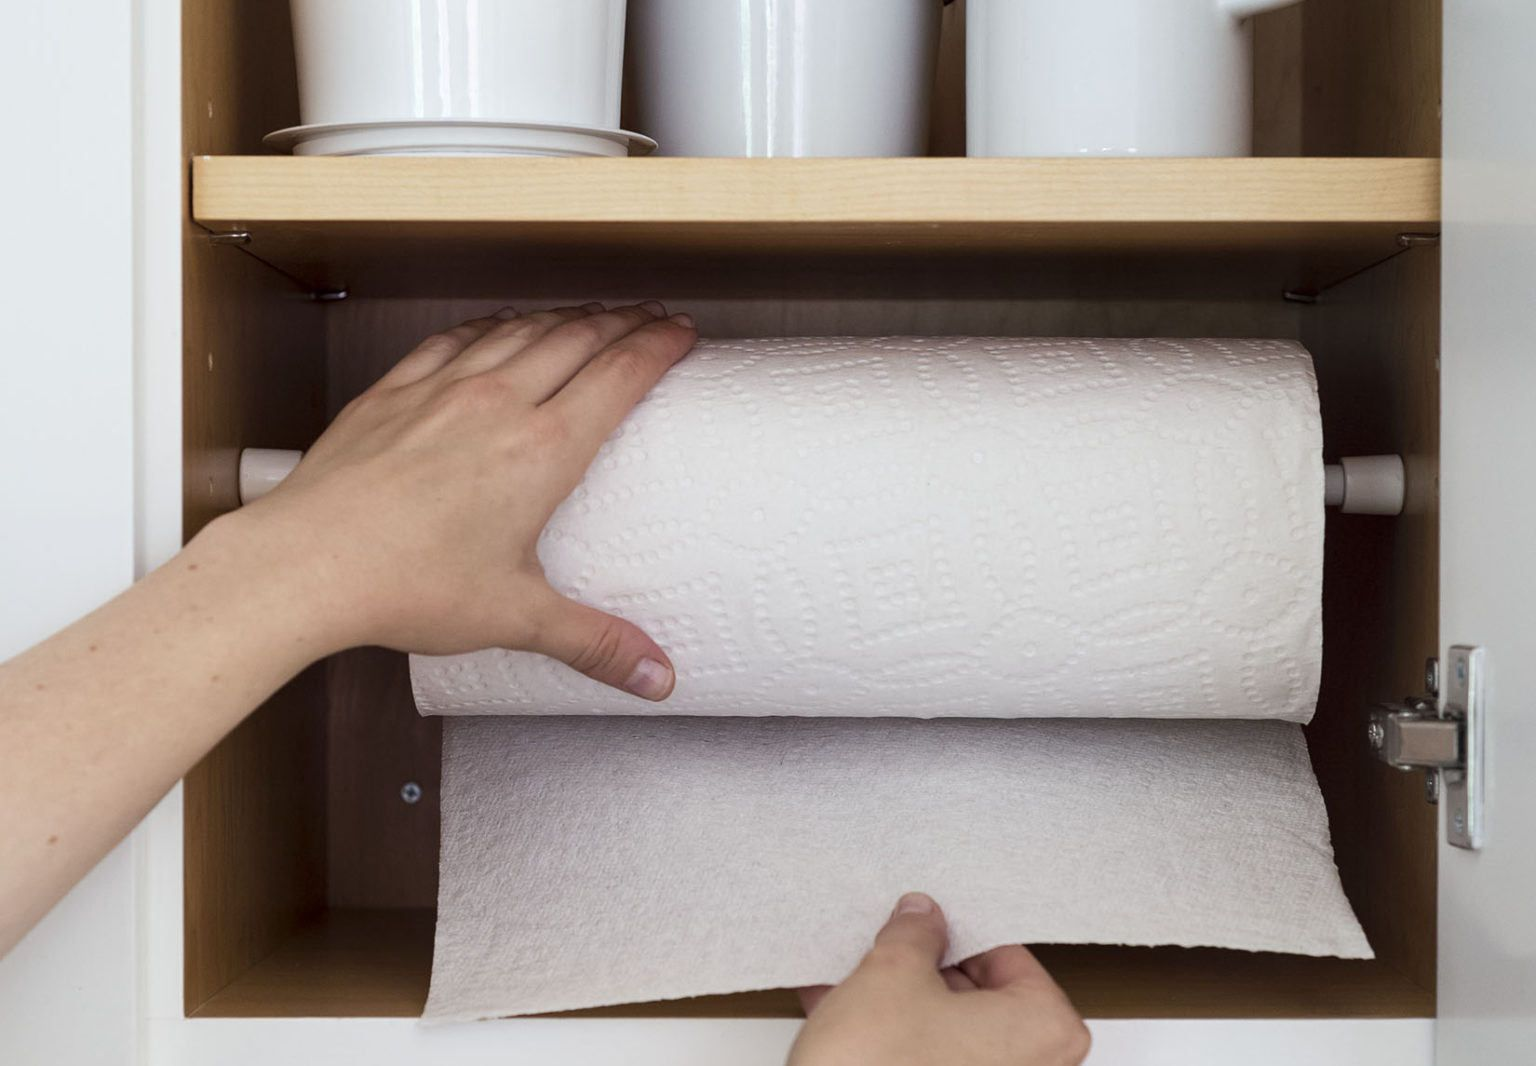 Aha Hack Tension Rod As Paper Towel Holder Paper Towel Holder